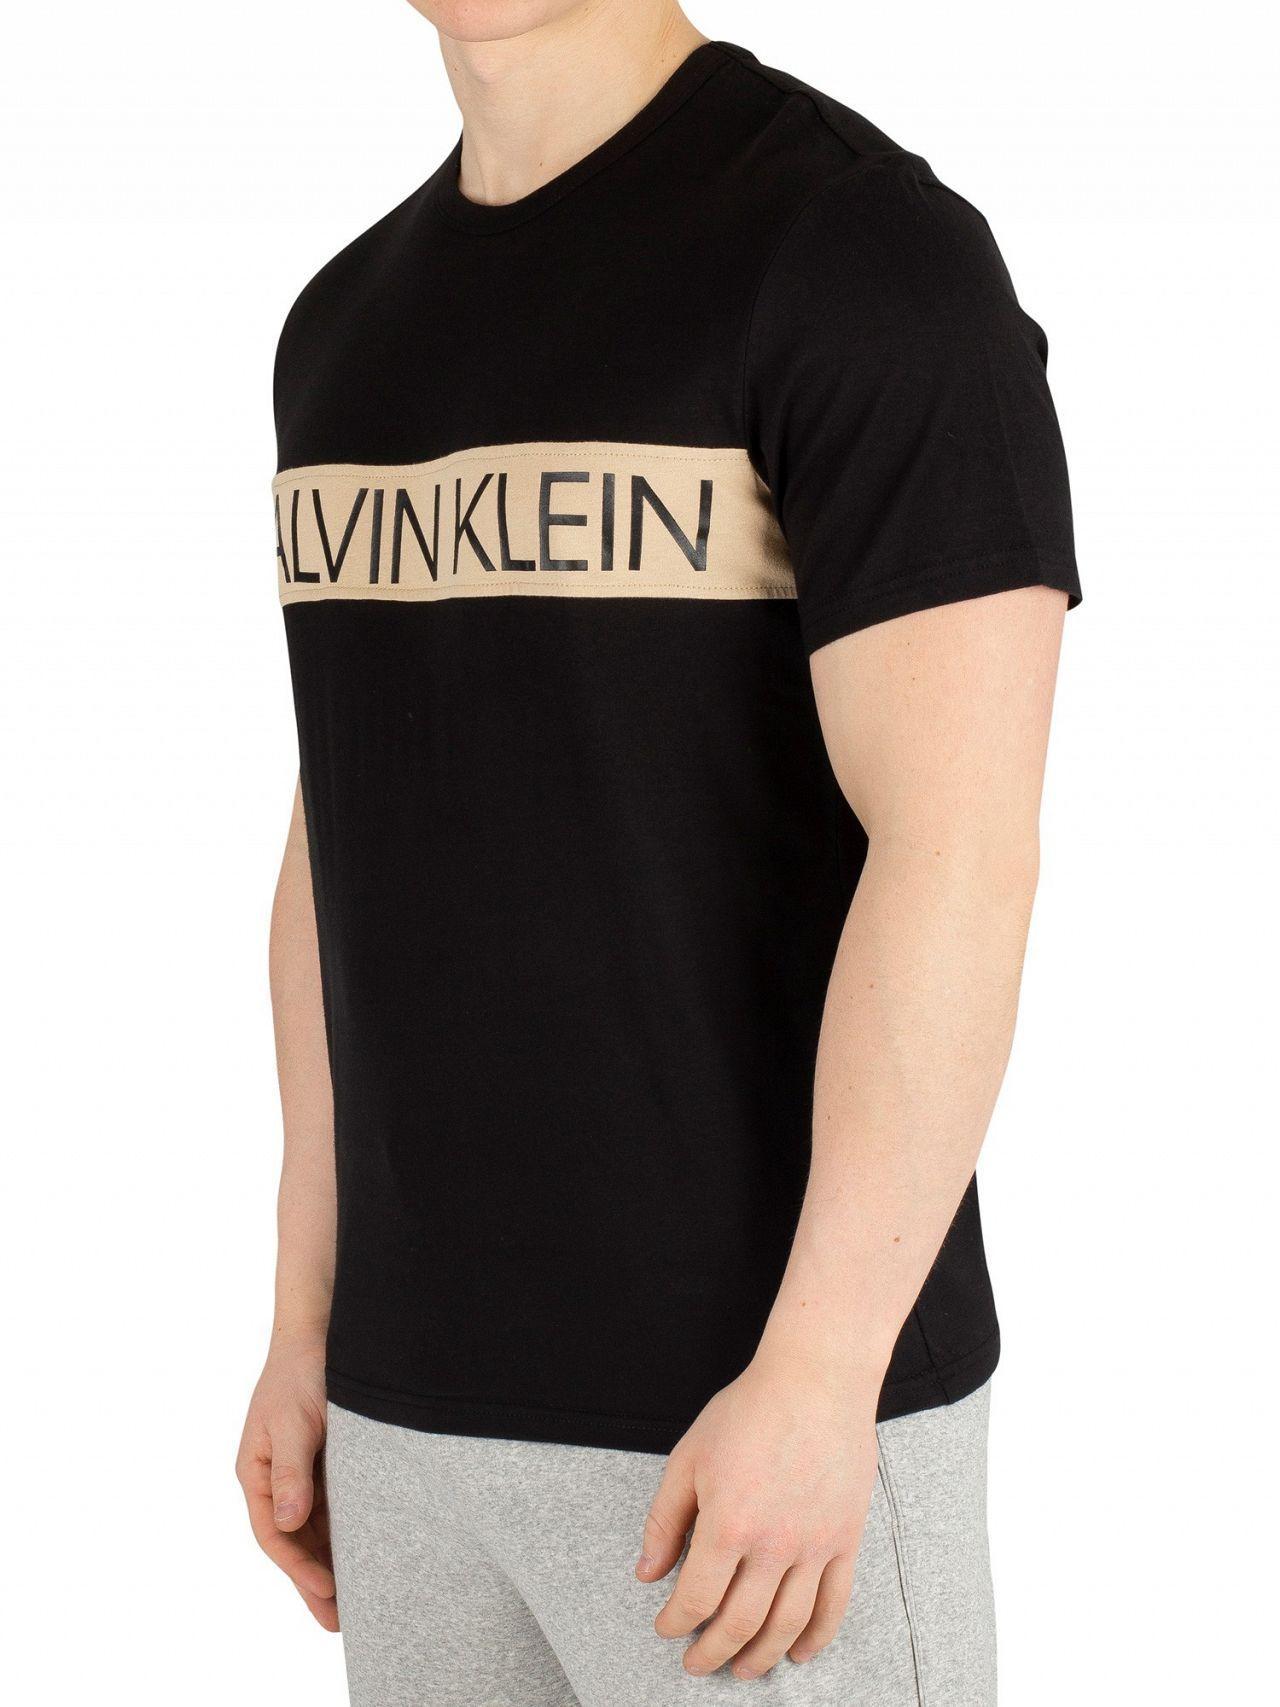 873040b36a1c Lyst - Calvin Klein Black Crew Neck T-shirt in Black for Men